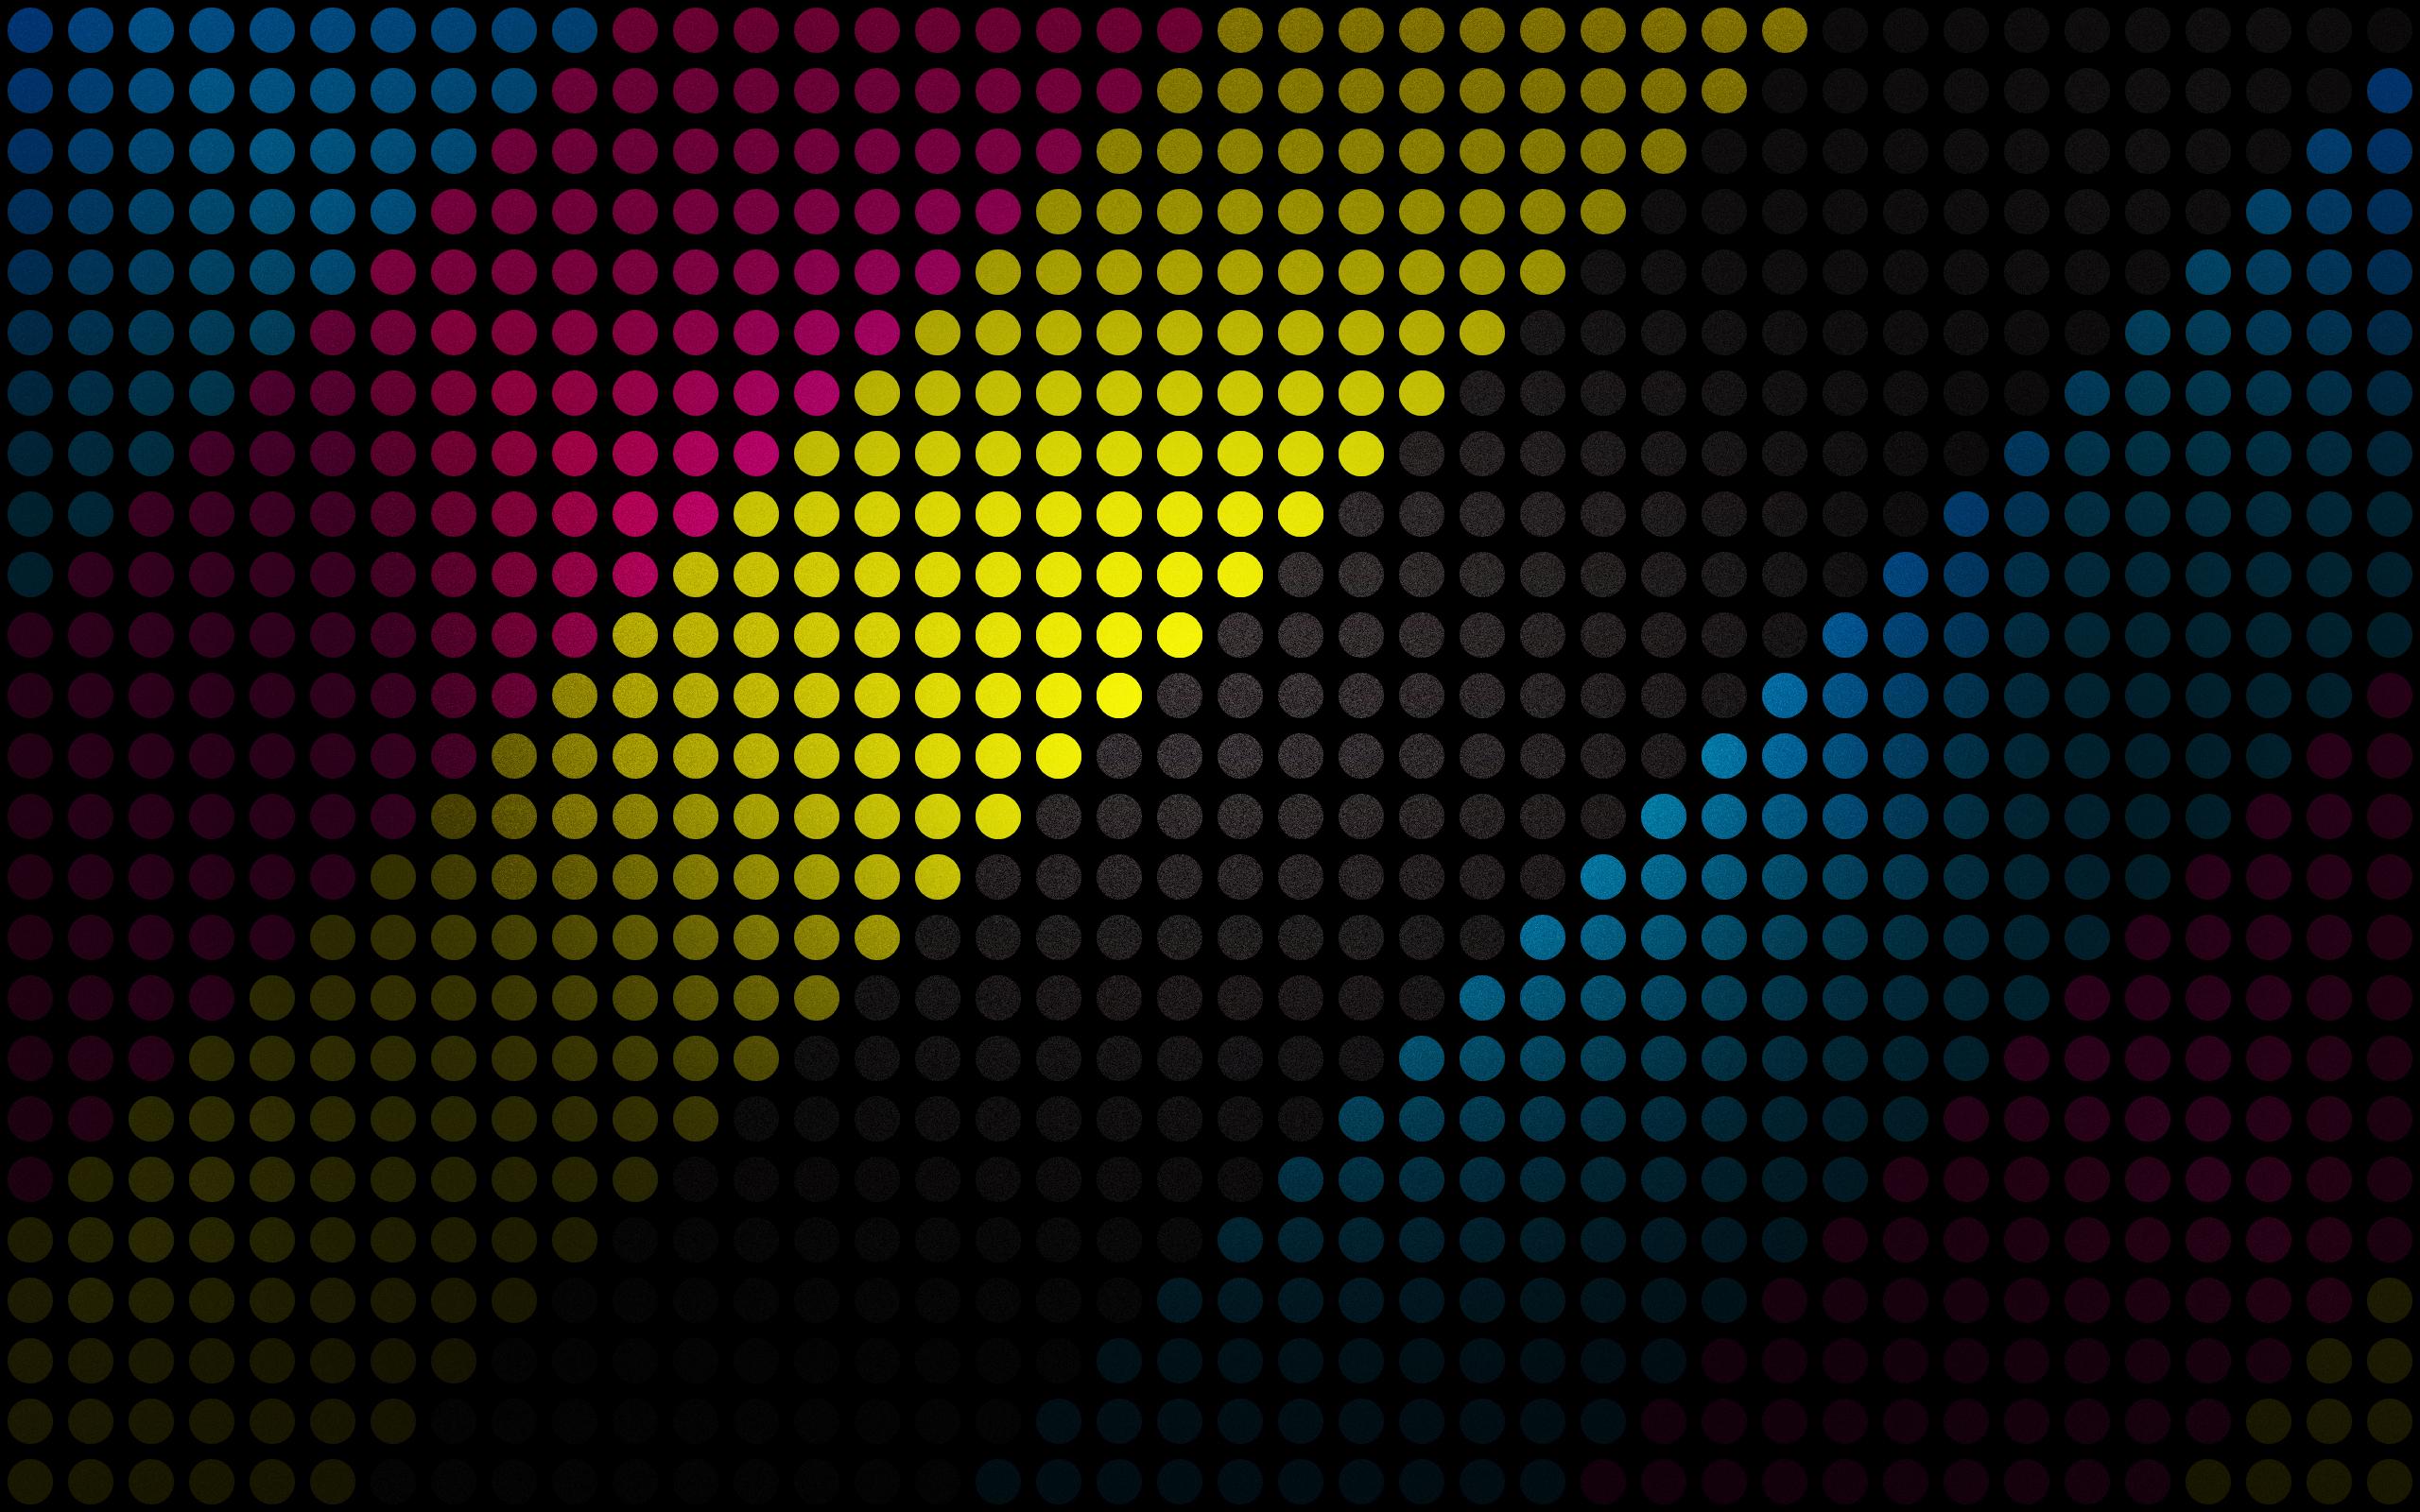 Cool Desktop Wallpaper Designs 2560x1600